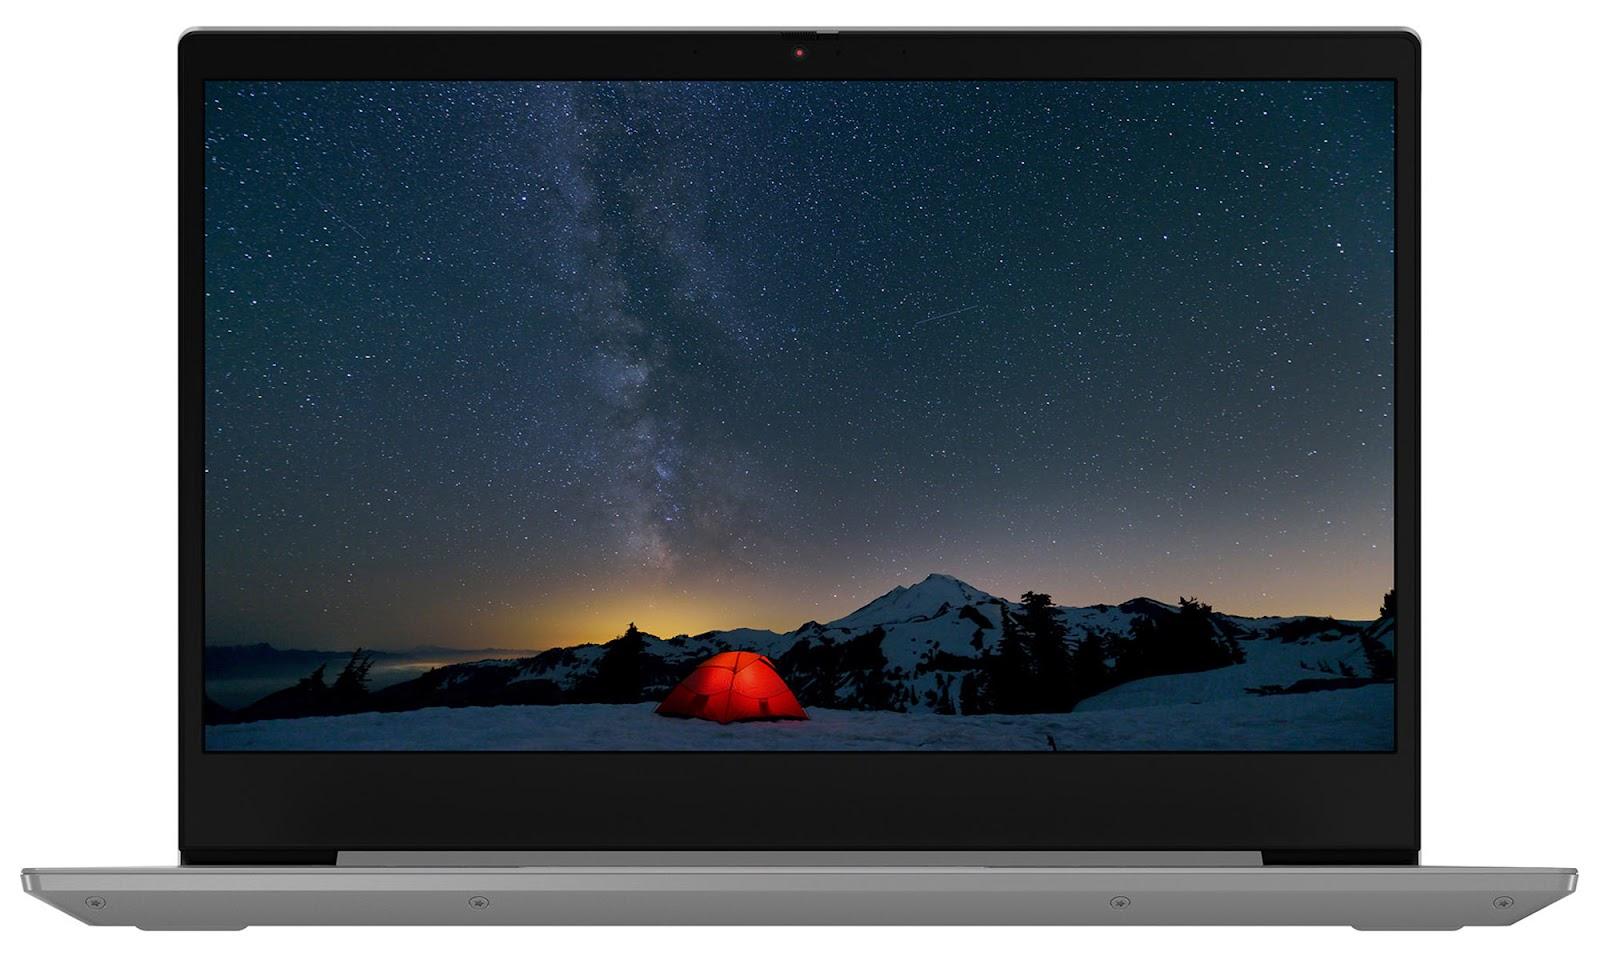 Фото 1. Ноутбук Lenovo ThinkBook 14 IIL (20SL00F1RU)